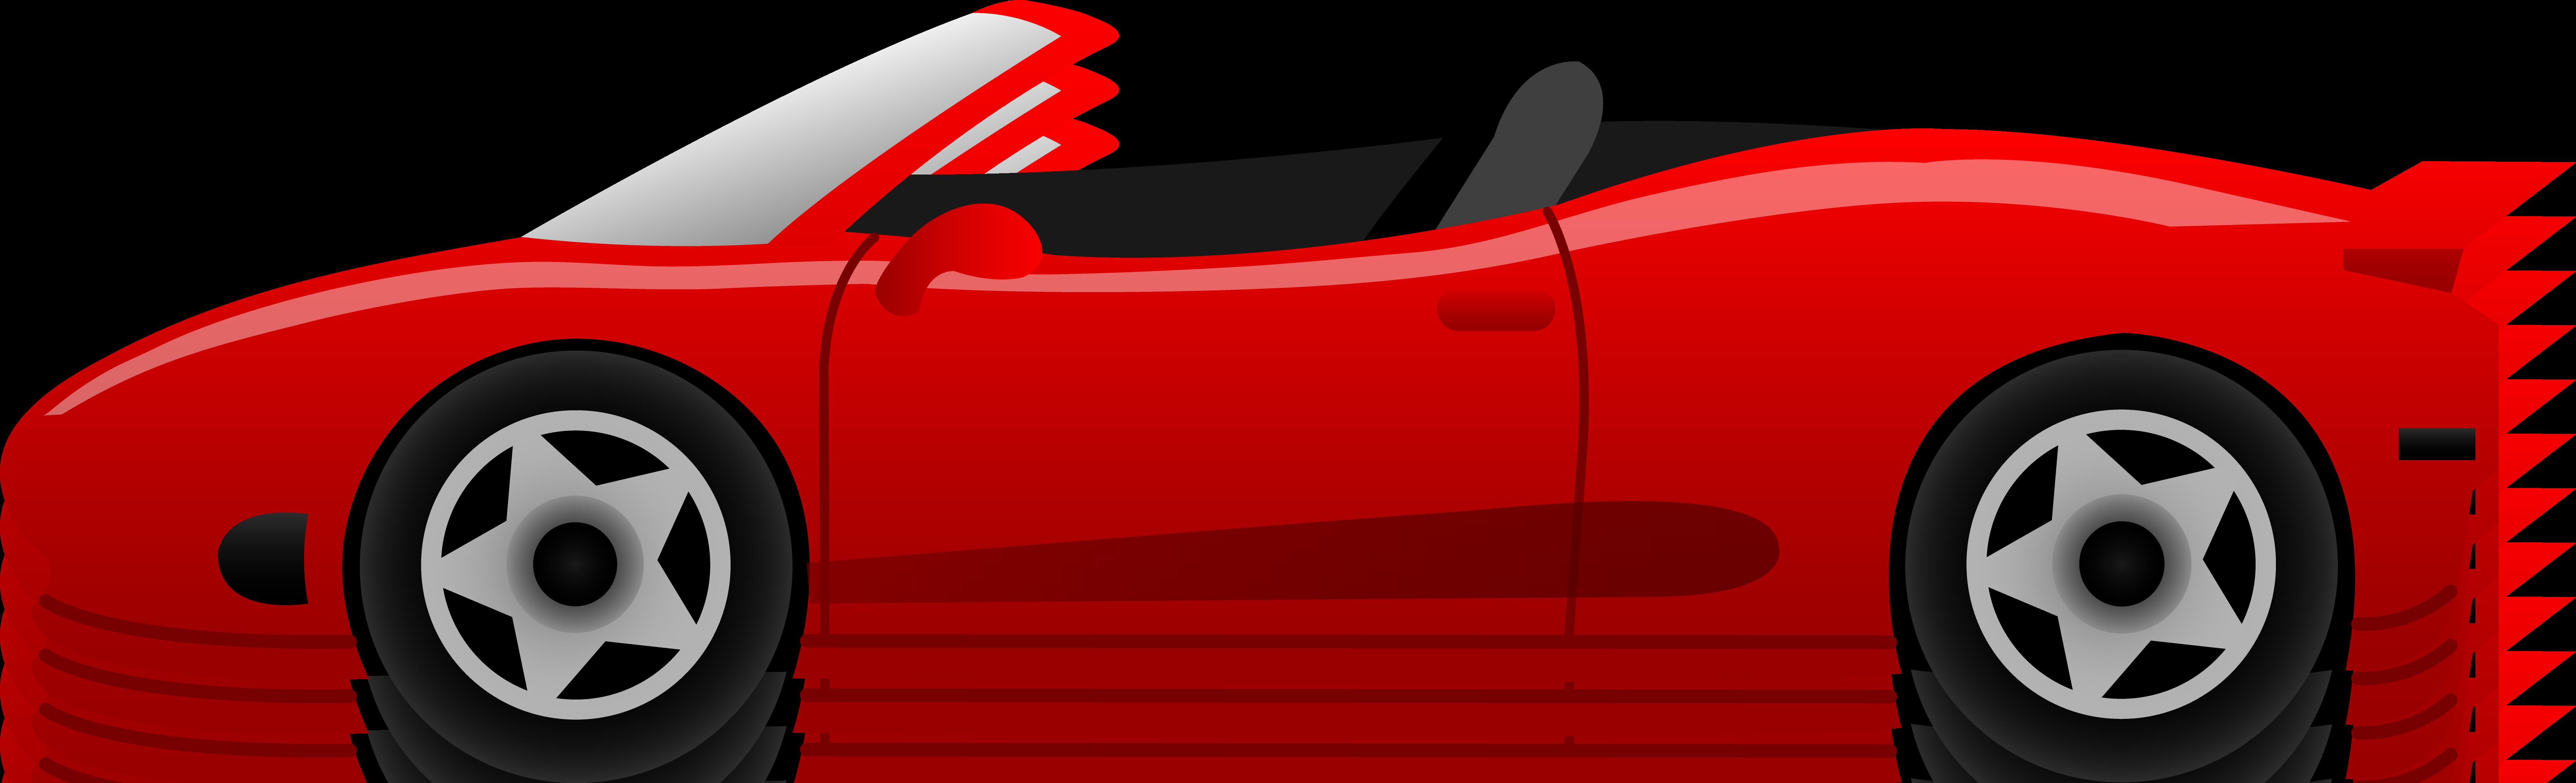 7863x2391 Car Clipart Clipart Panda